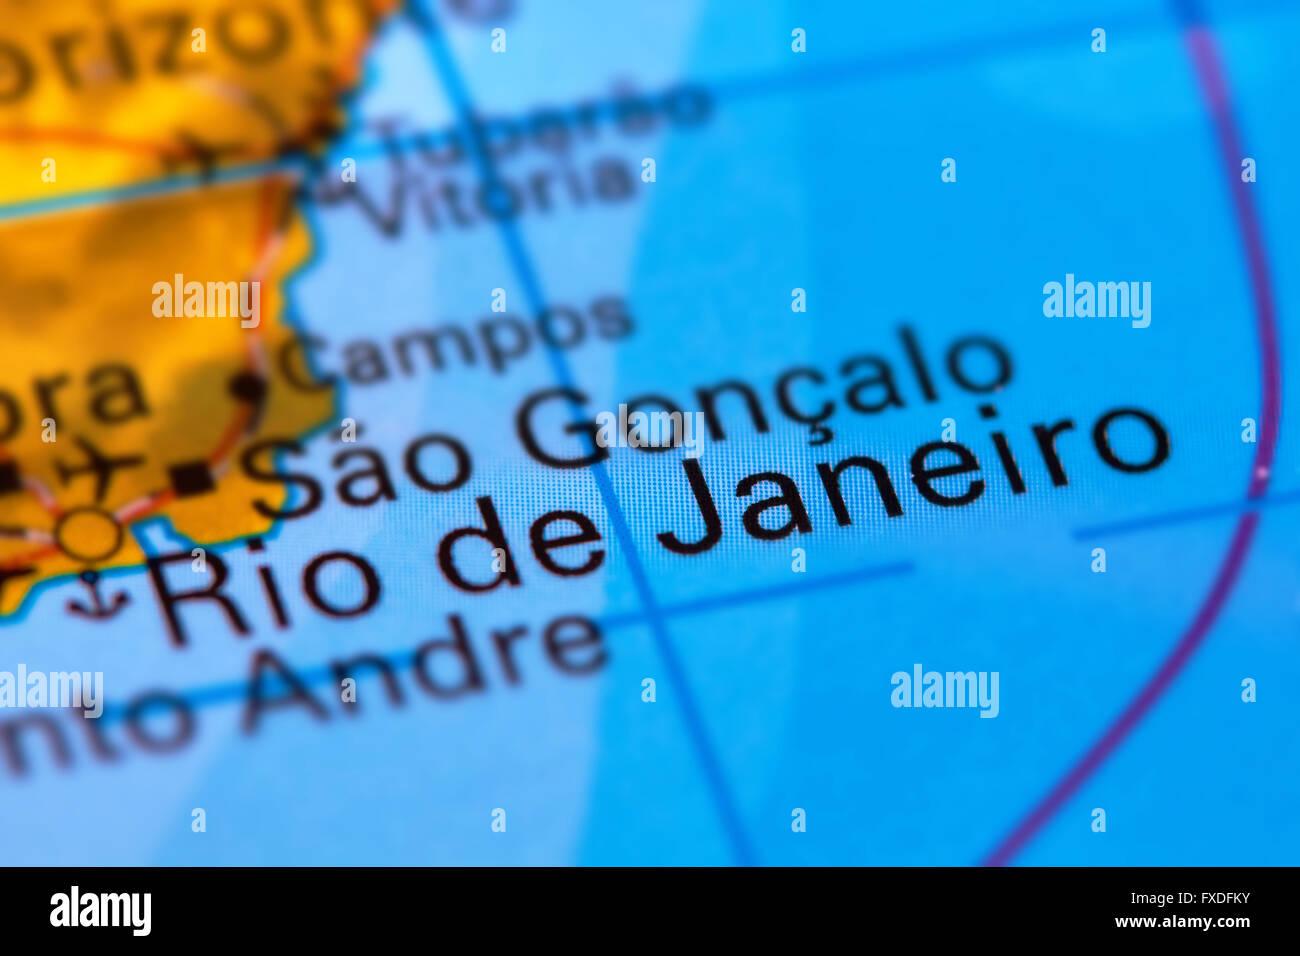 Rio de Janeiro City in Brazil on the World Map Stock Photo